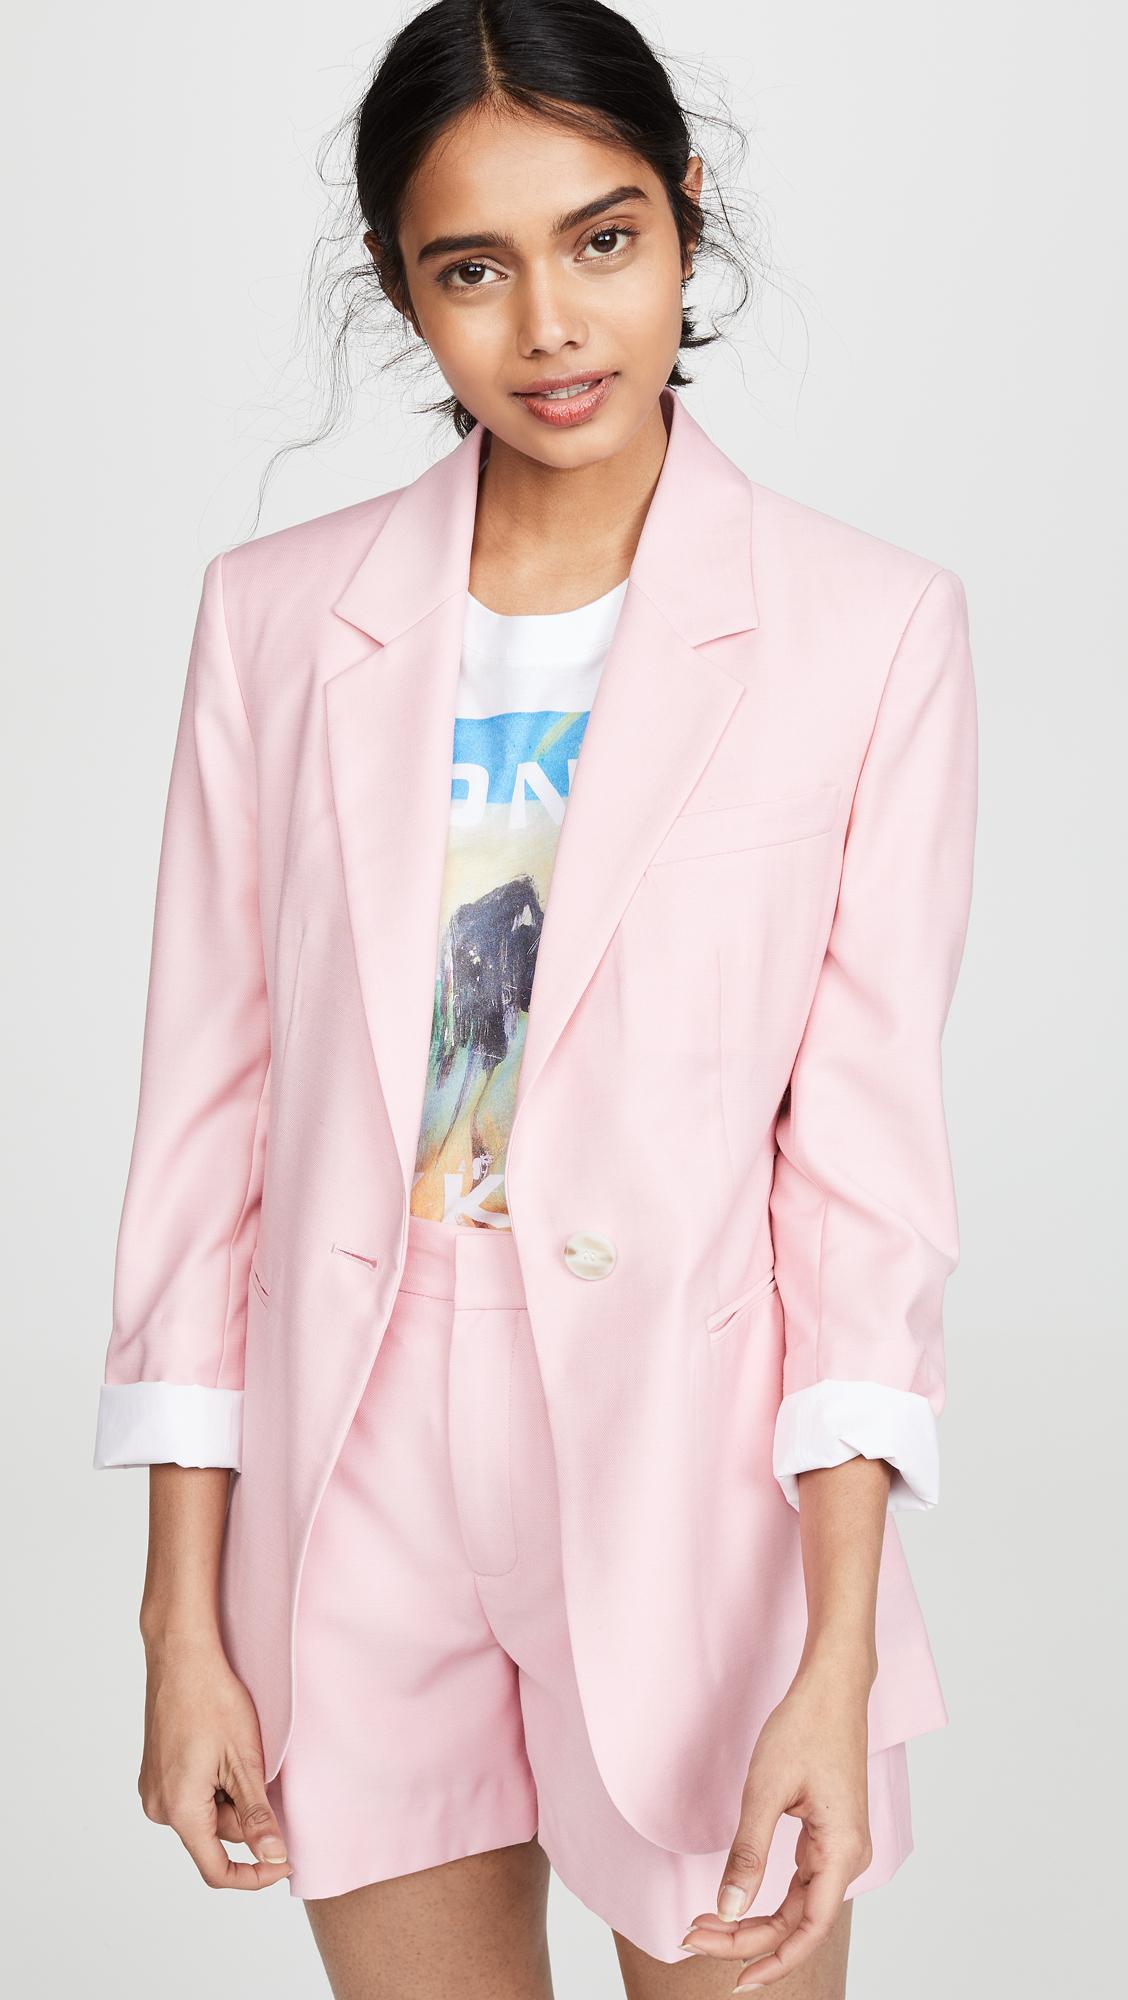 d43e5c078e6002 Lyst - Edition10 Wrap Waist Blazer in Pink